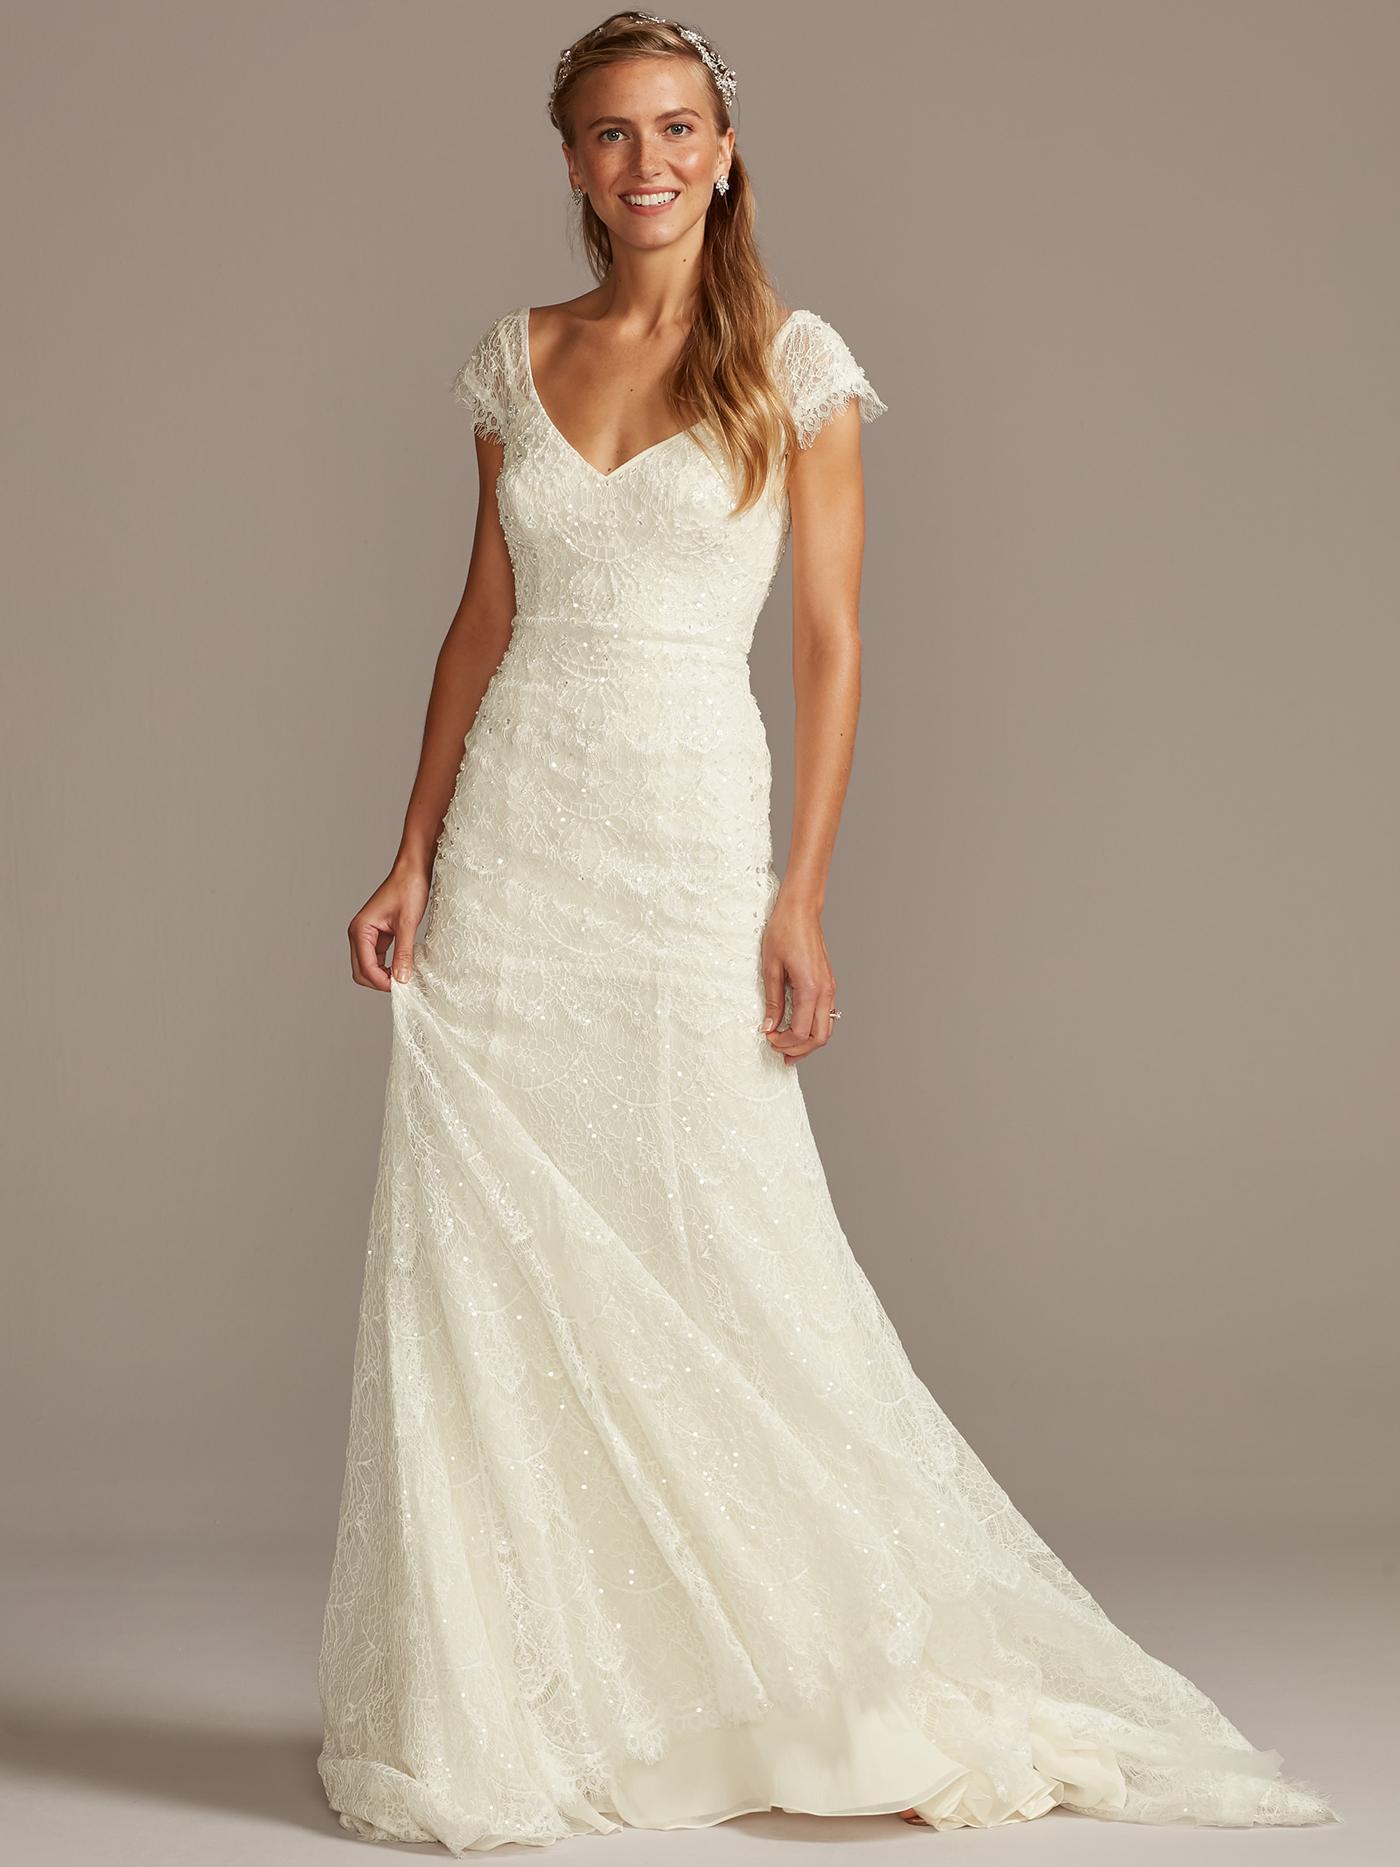 davids bridal melissa sweet cap sleeve, v-neck wedding dress fall 2020